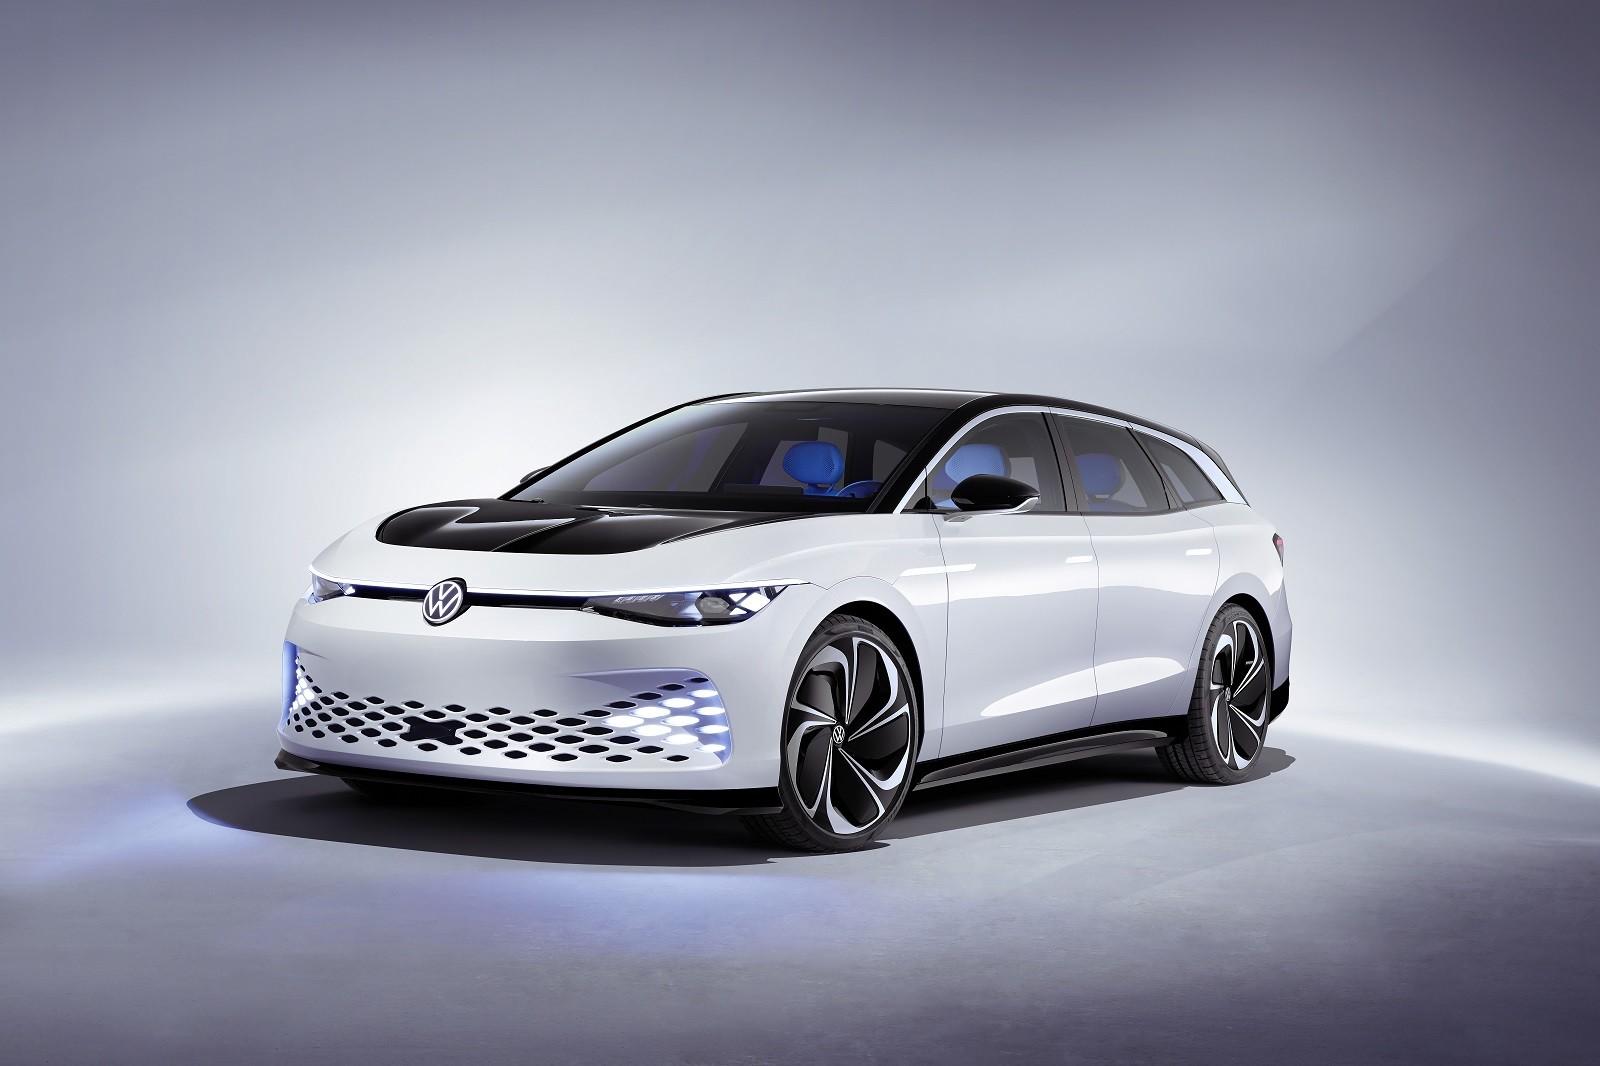 Foto de Volkswagen ID. Space Vizzion Concept (1/32)